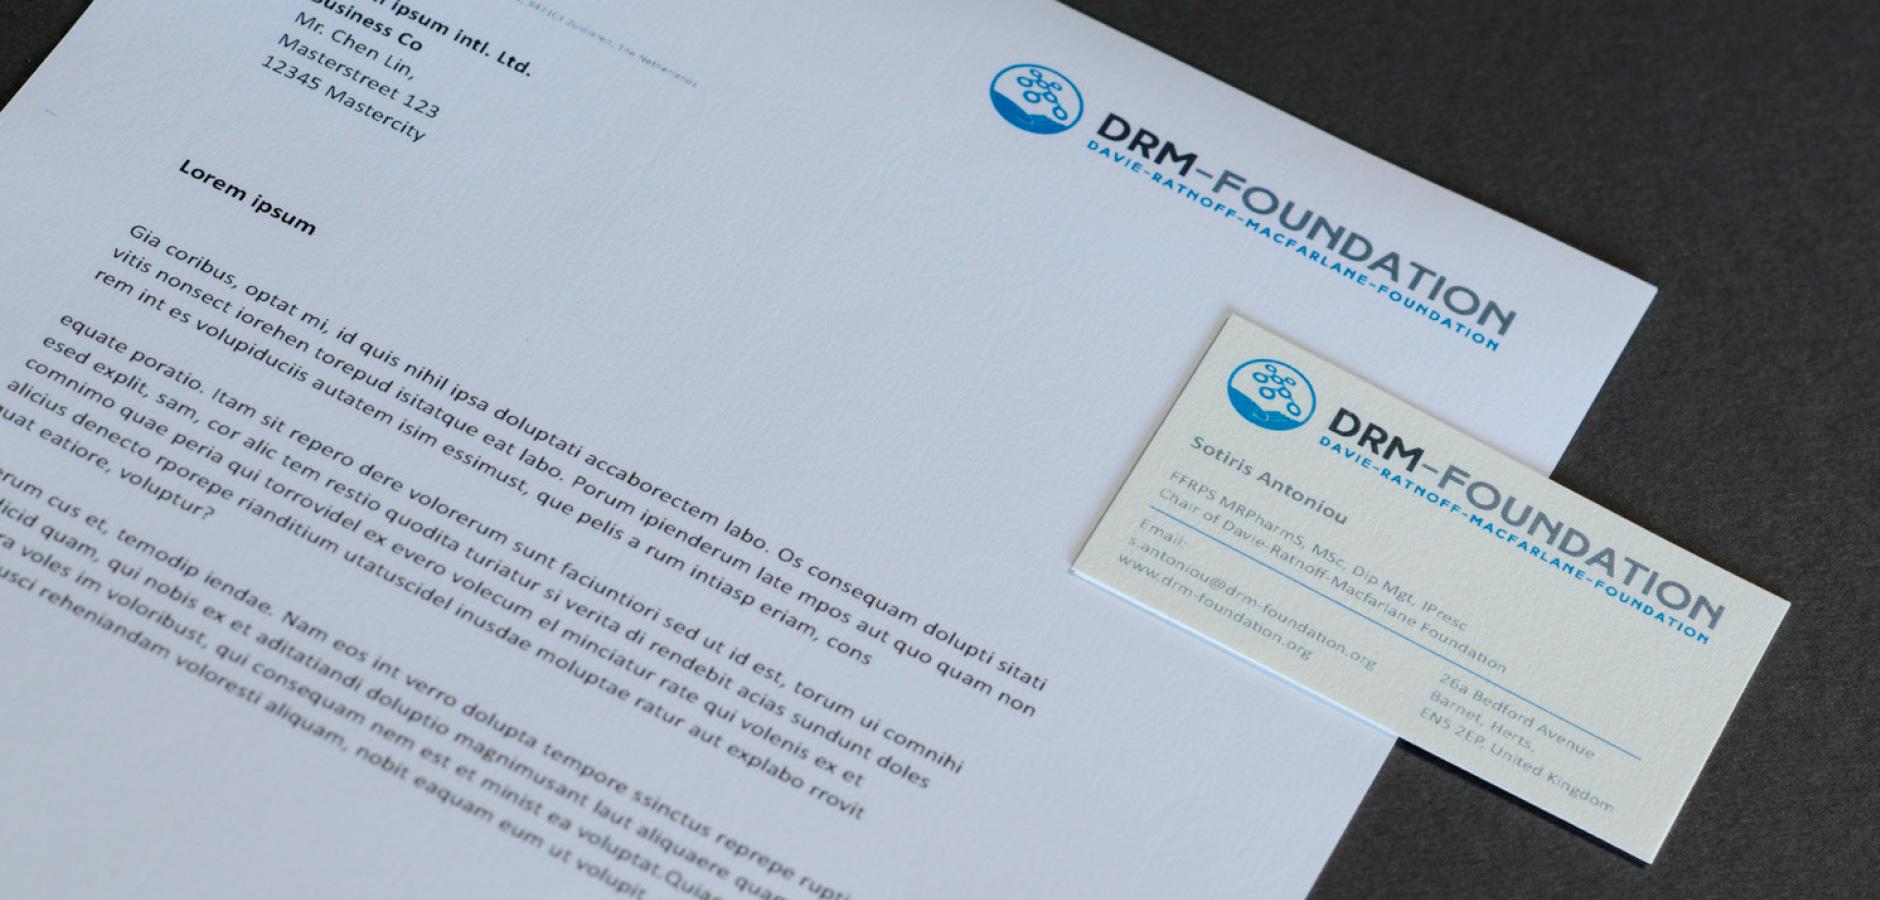 DRM-Foundation - Corporate Design